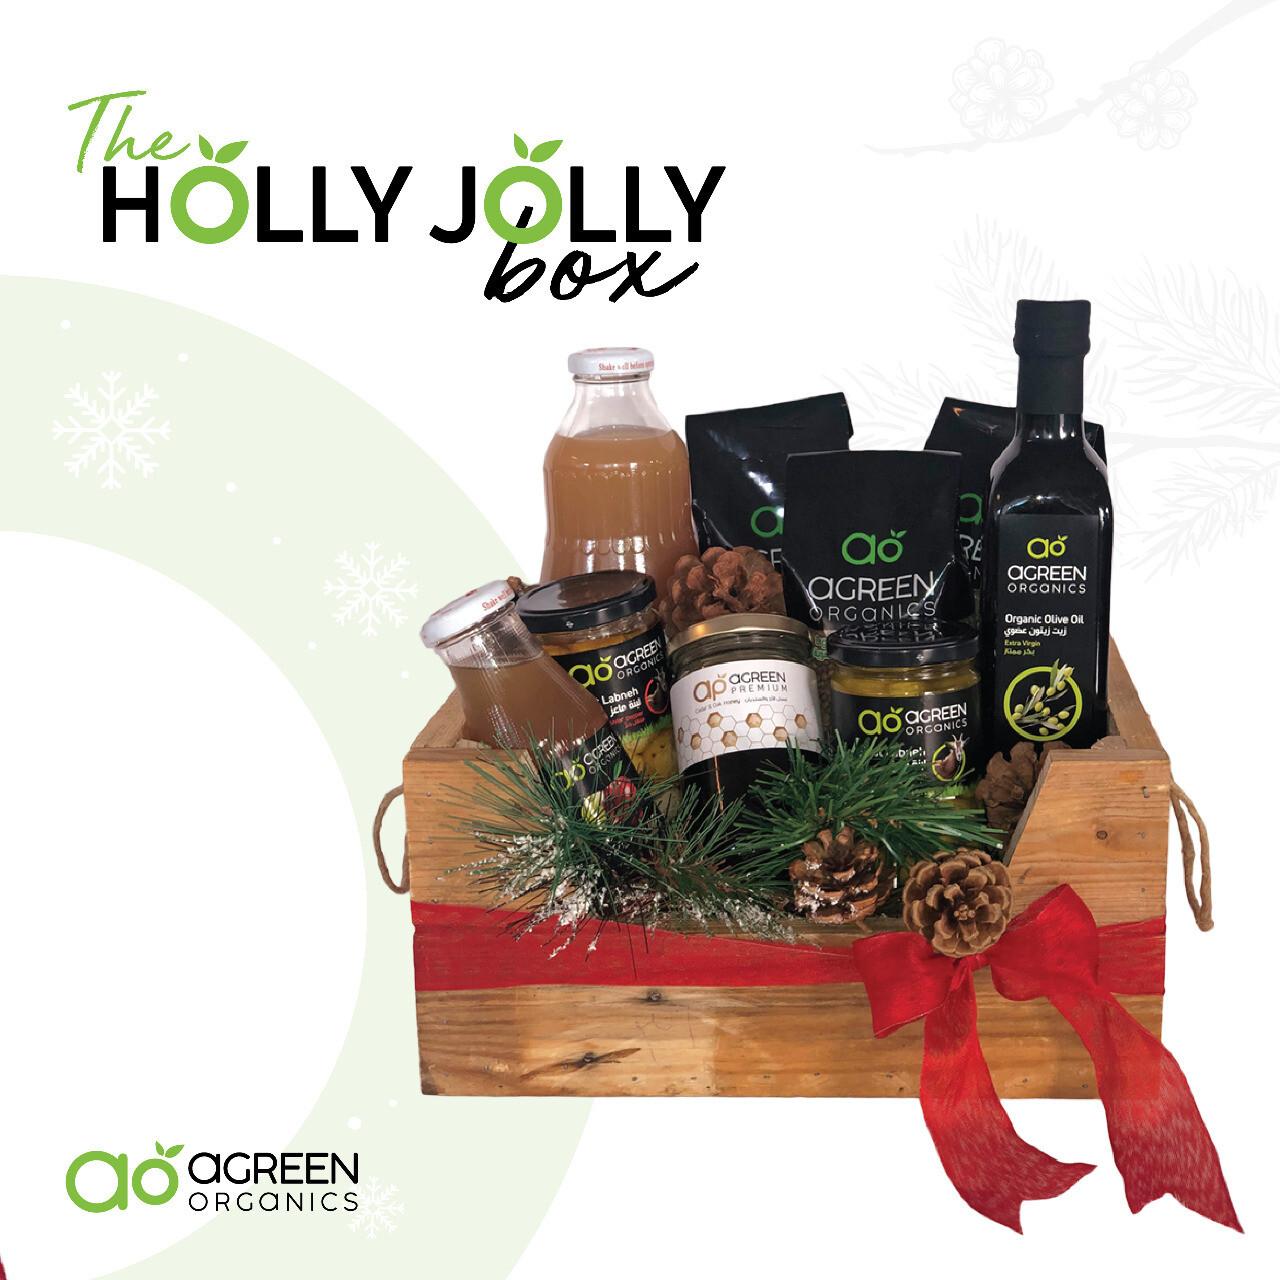 The Holy Joly Box - Agreen Organics